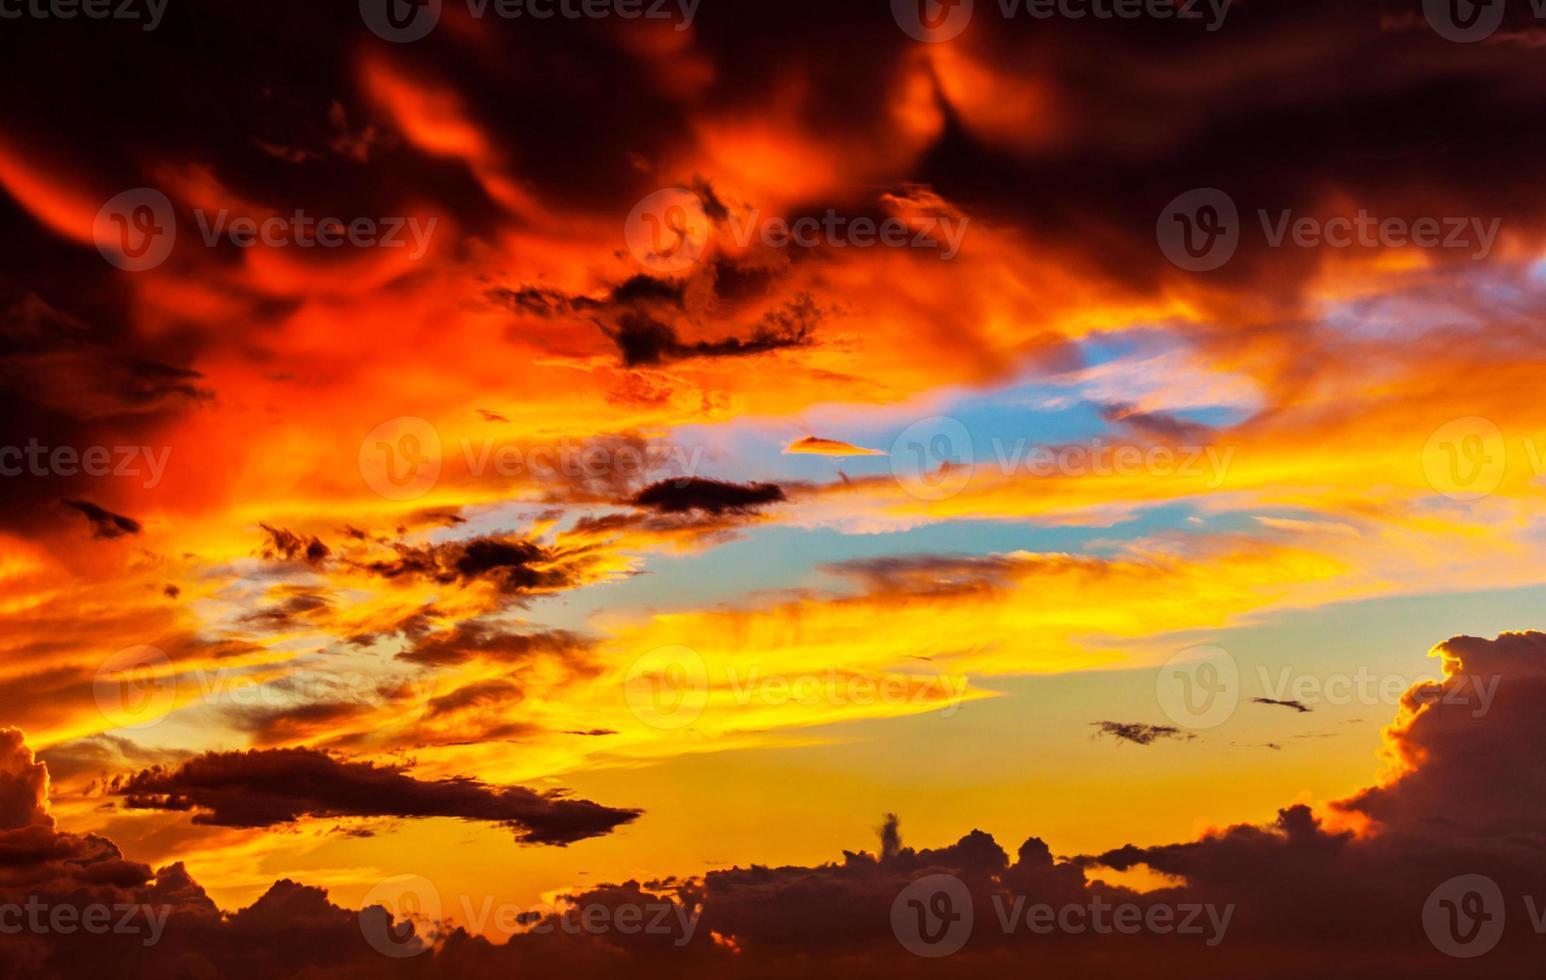 geweldige zonsondergang hemelachtergrond foto